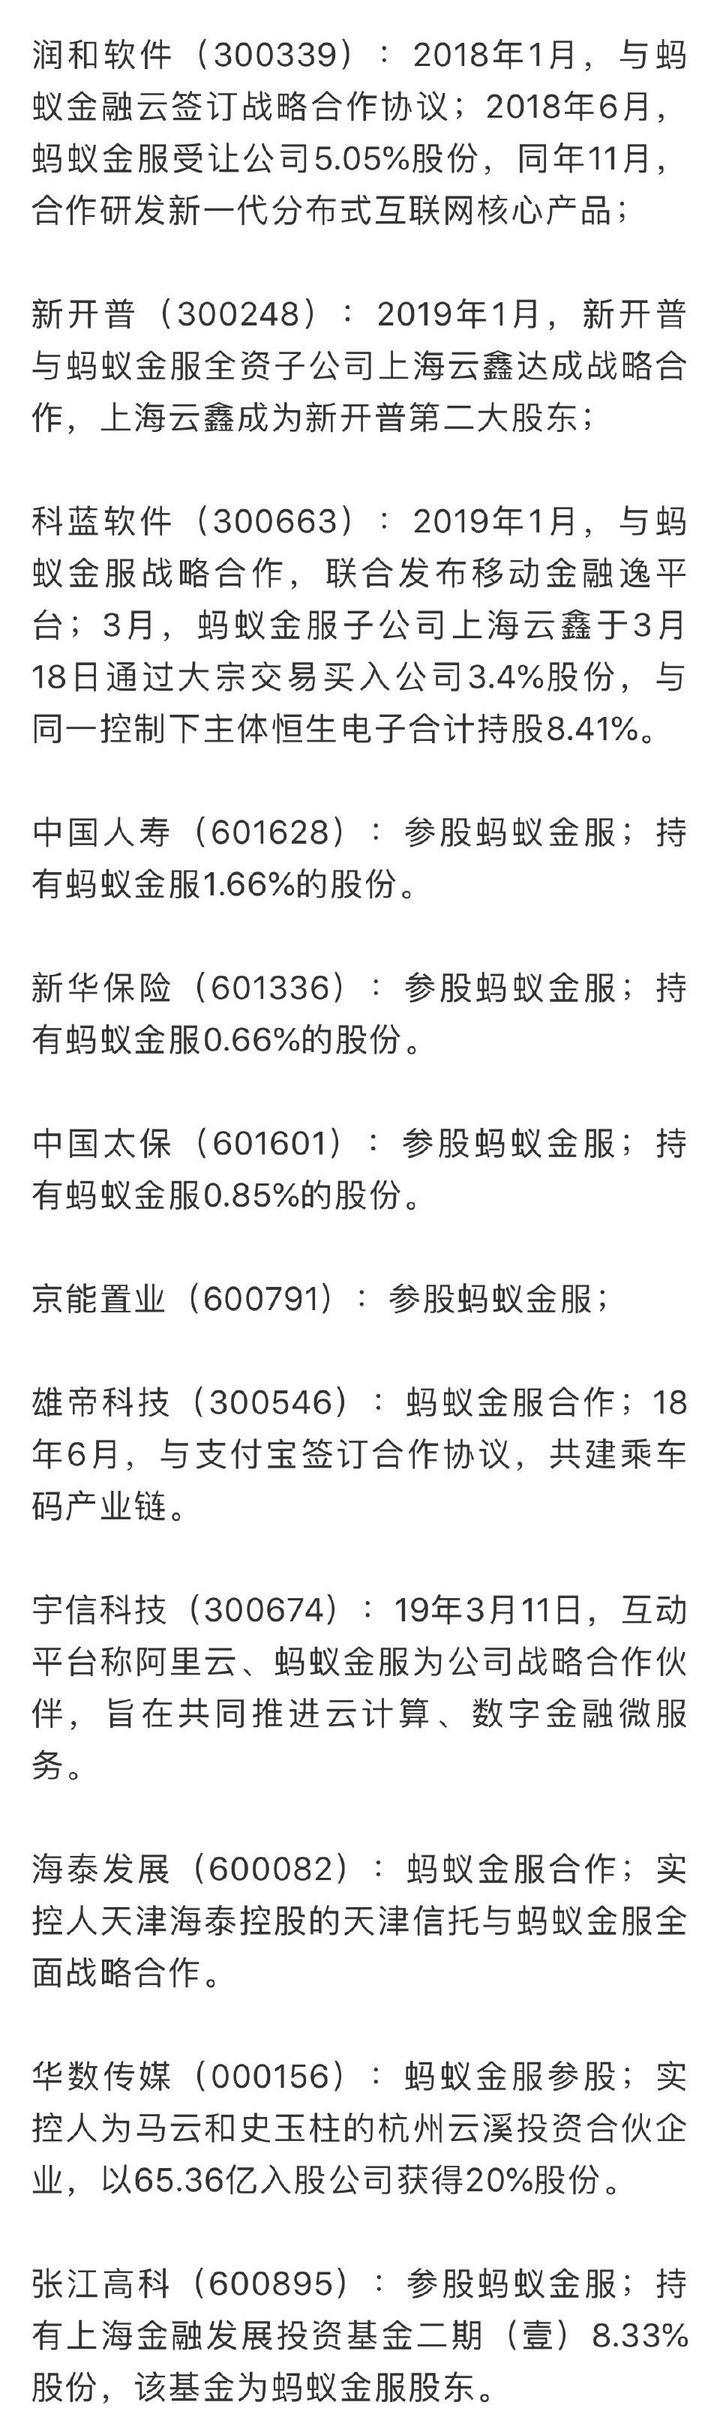 db68a6a1ec8f0e2f60b11772498449c.jpg